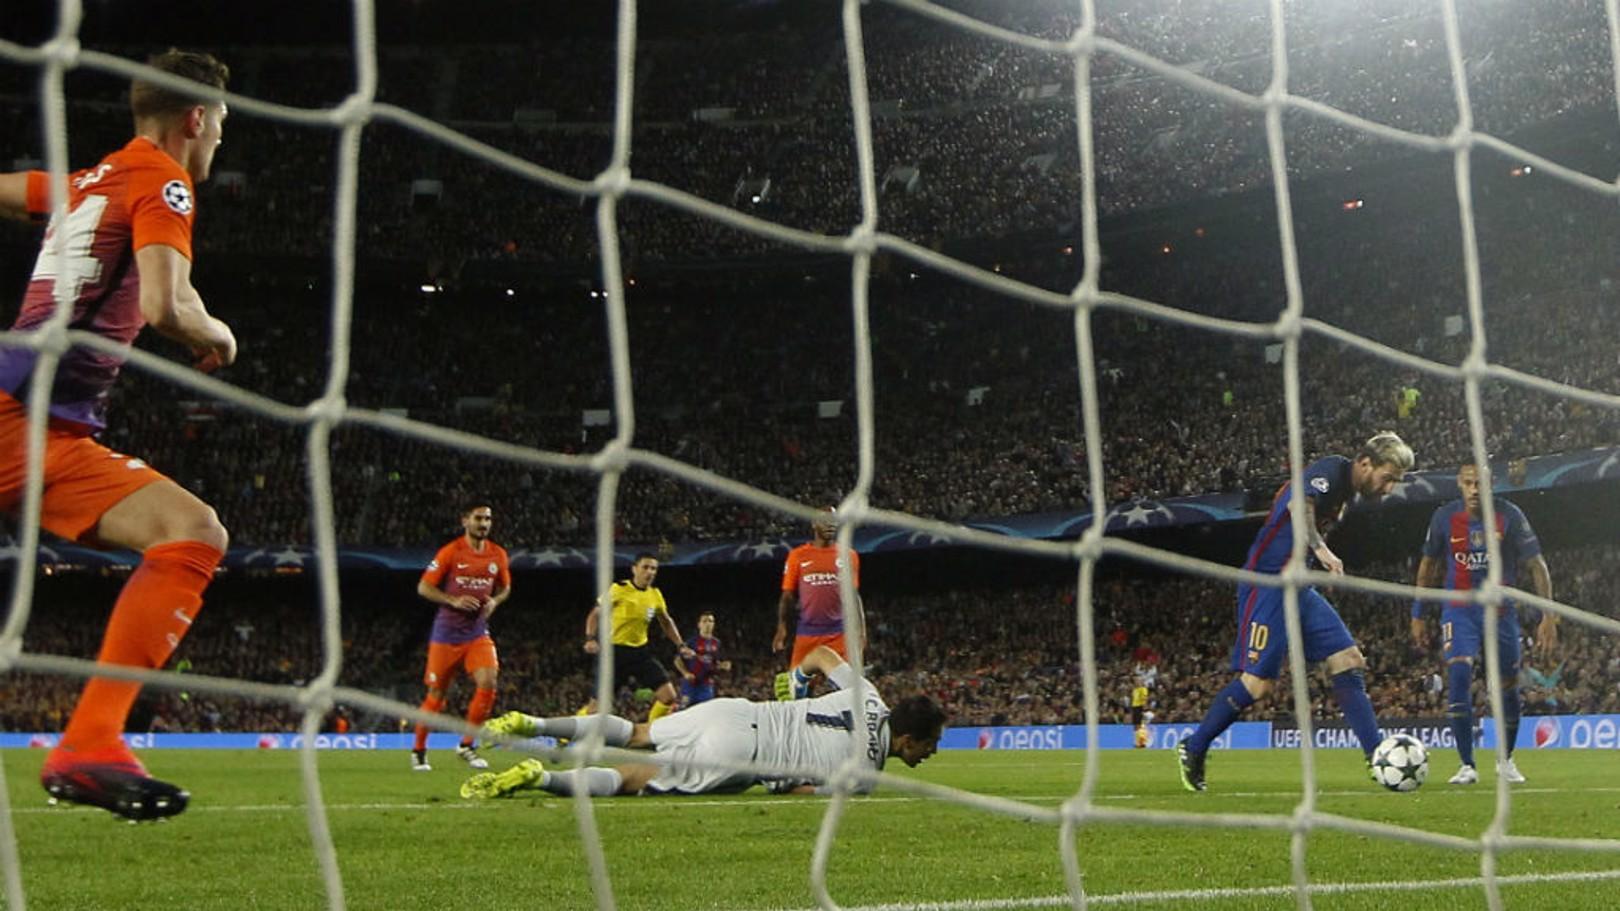 OPENER: Leo Messi puts Barca ahead